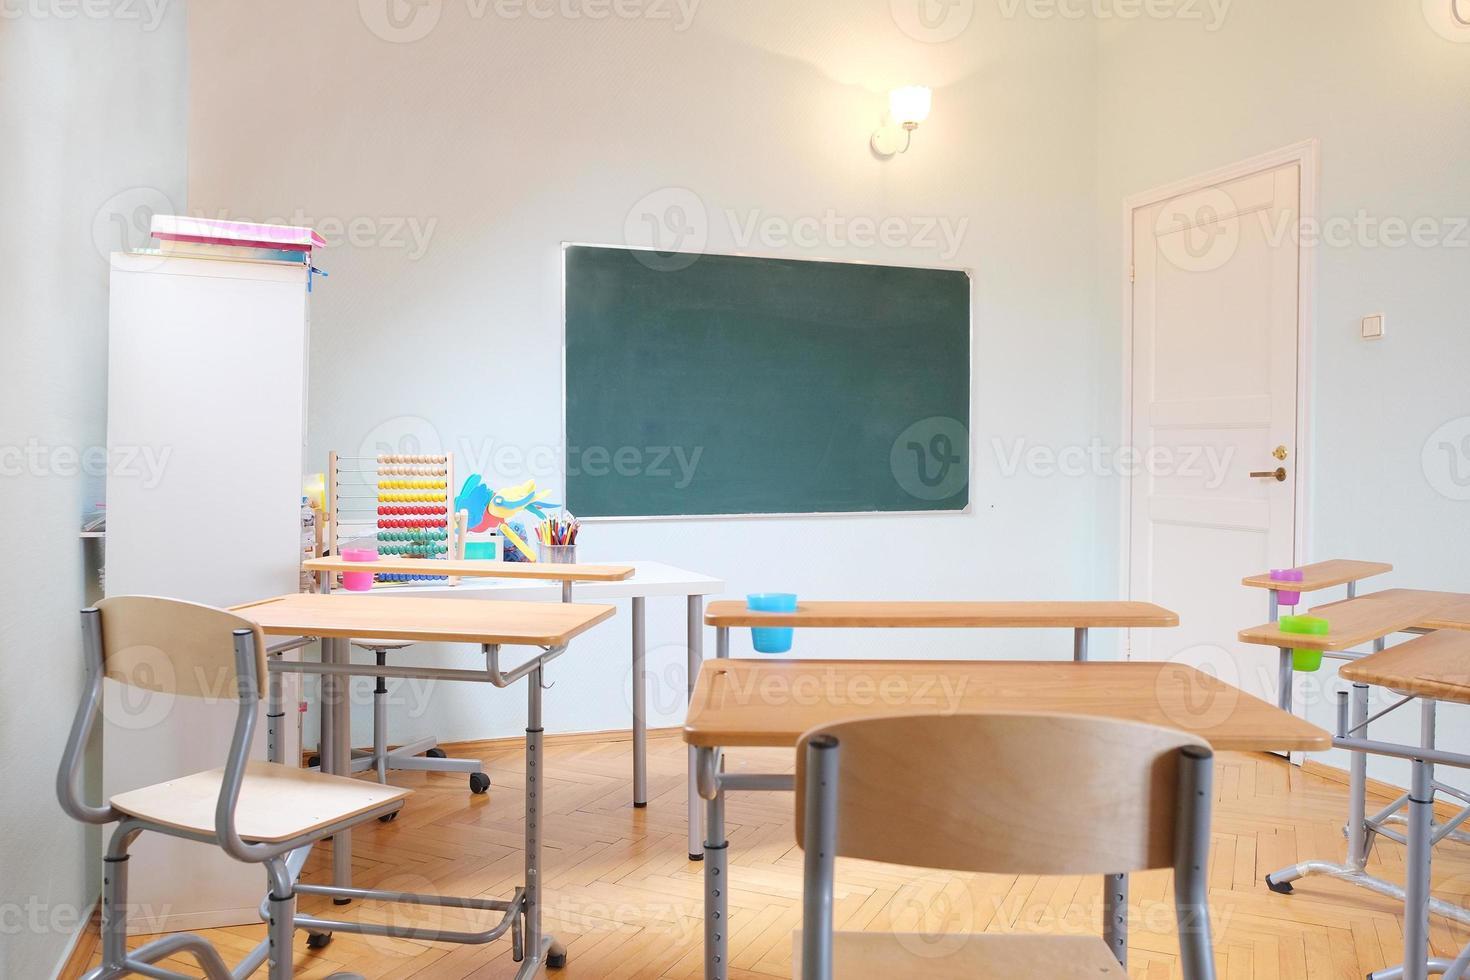 klas interieur foto